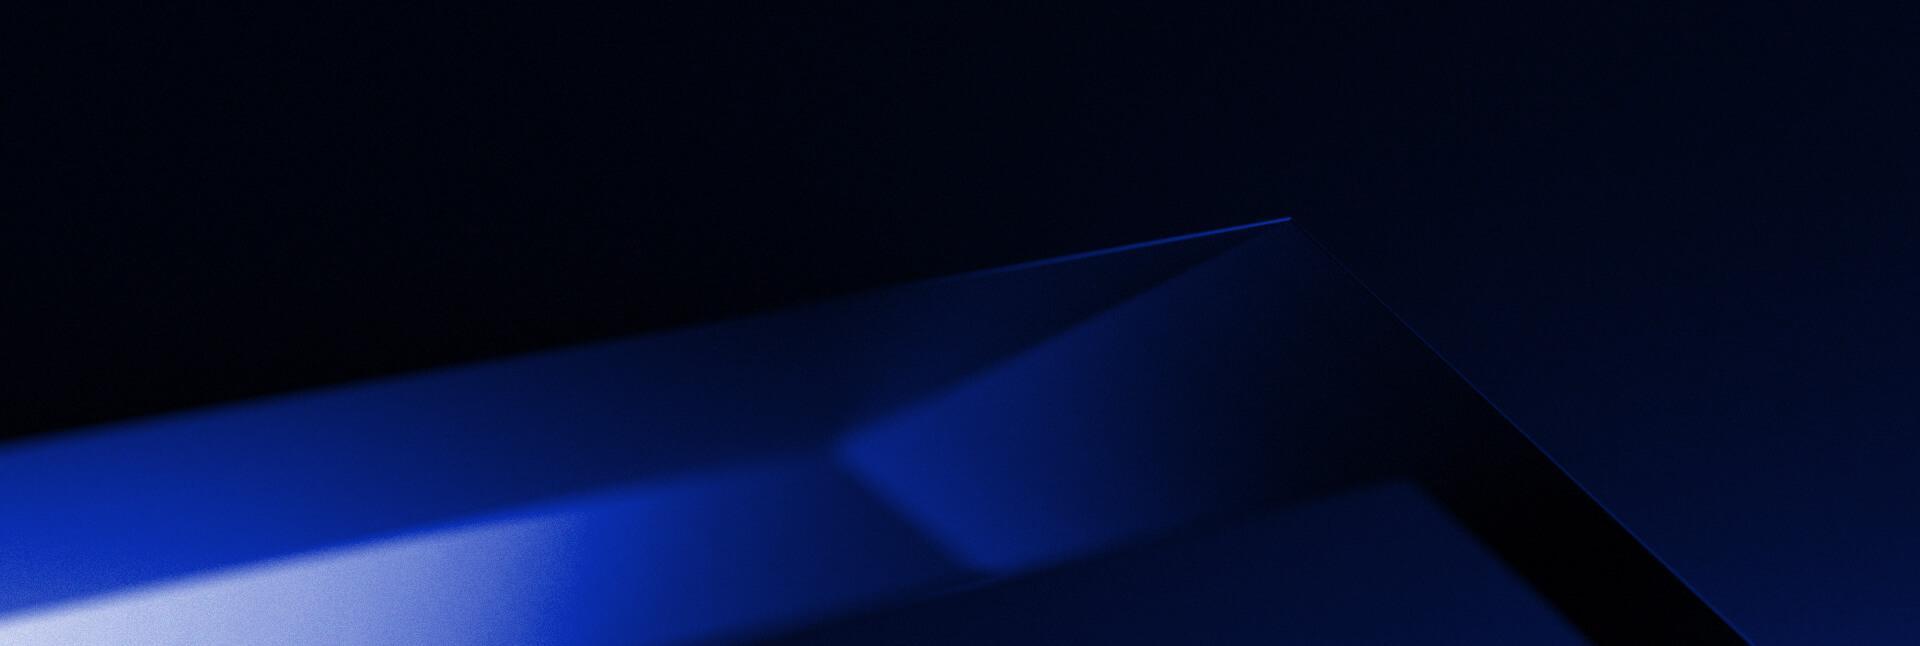 rra-background-blue-17-2021.jpg